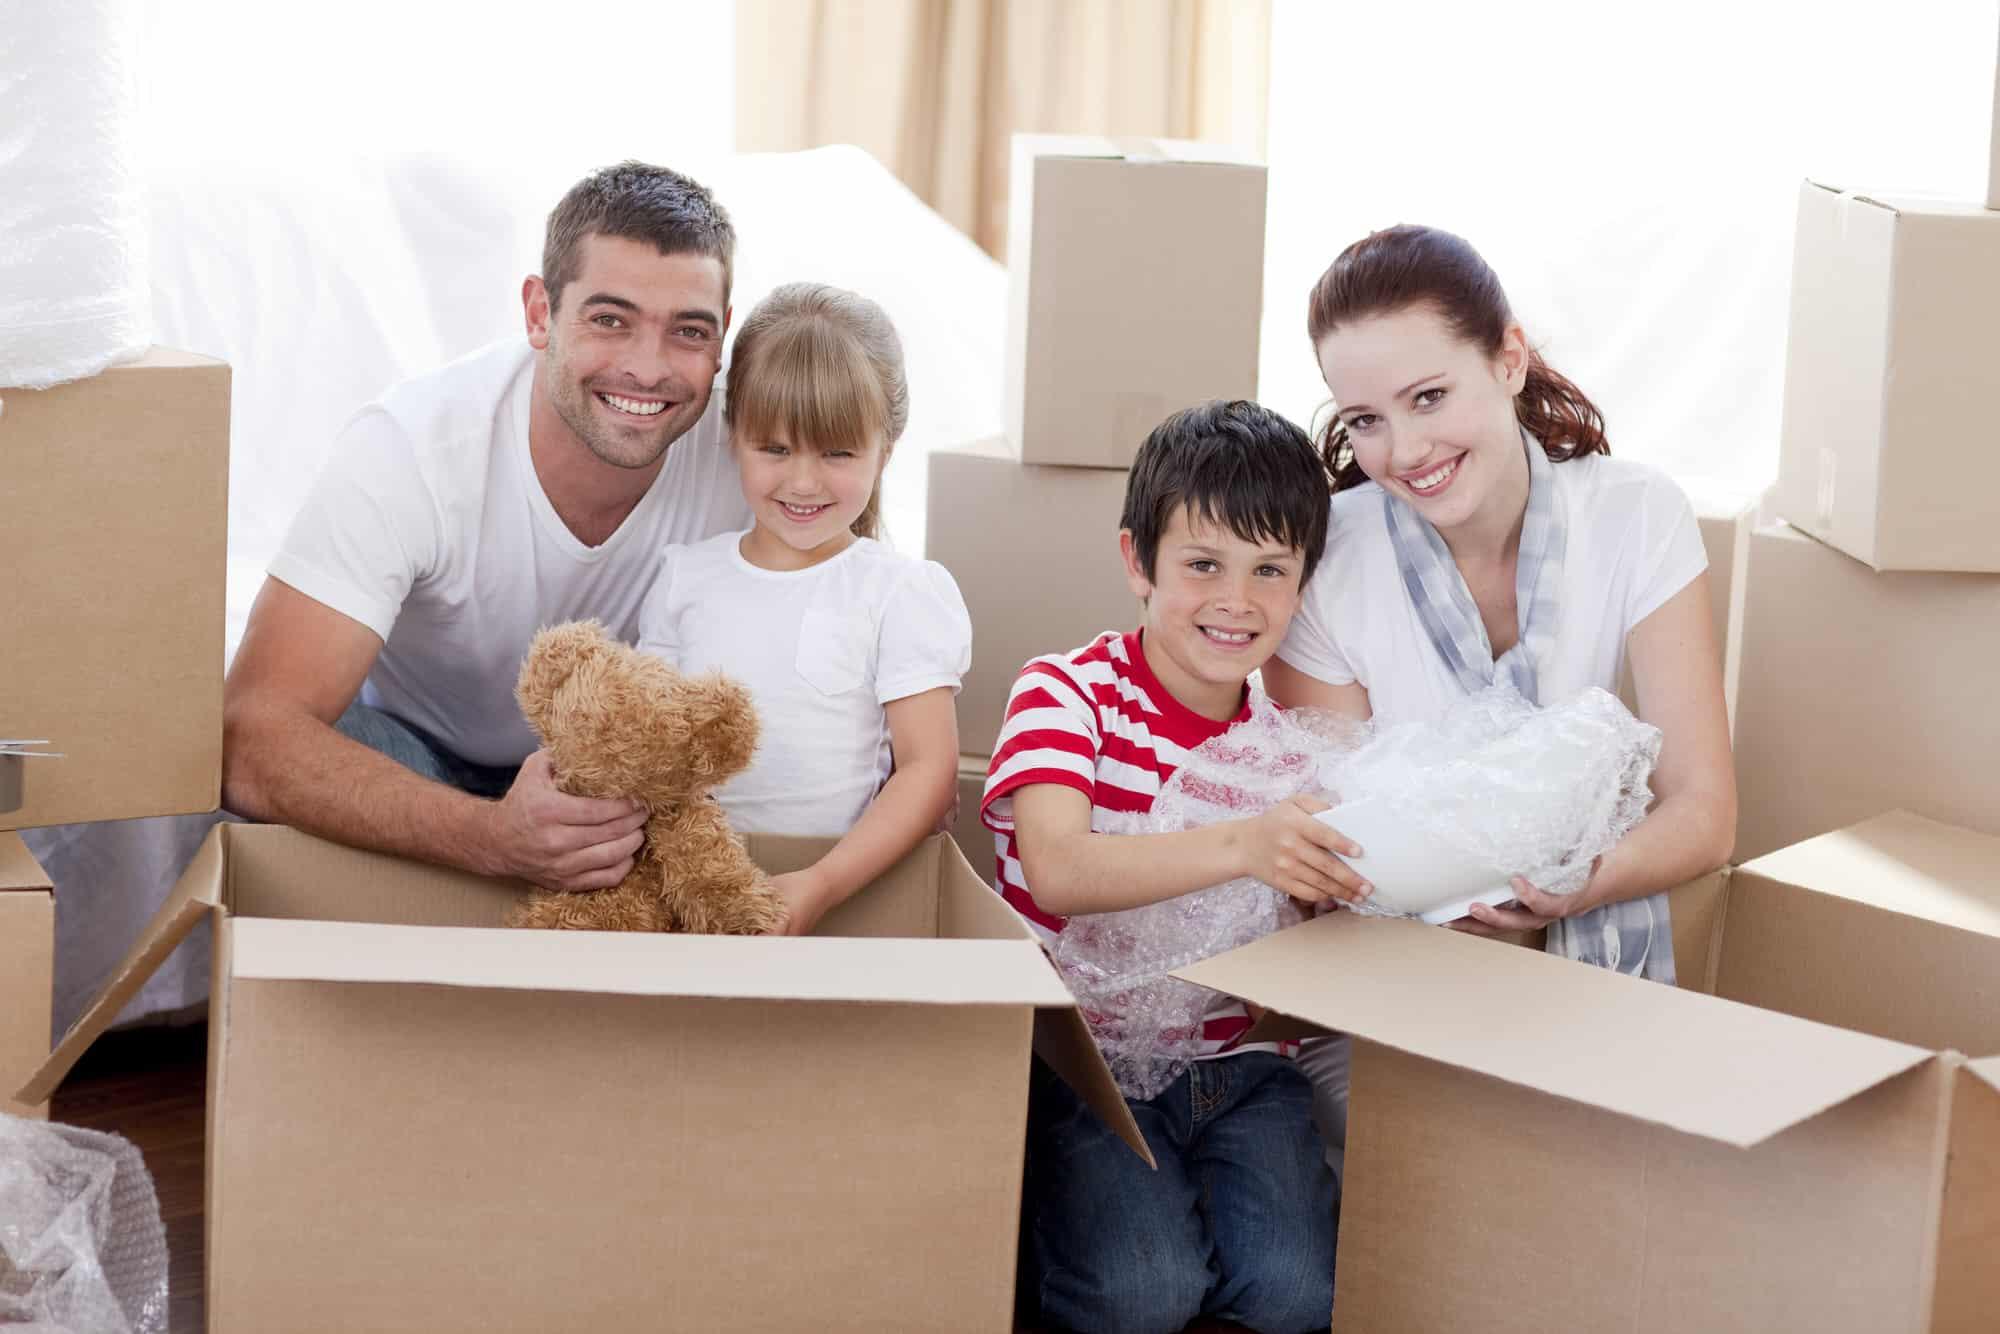 Umzugkartons und Verpackungsmaterial